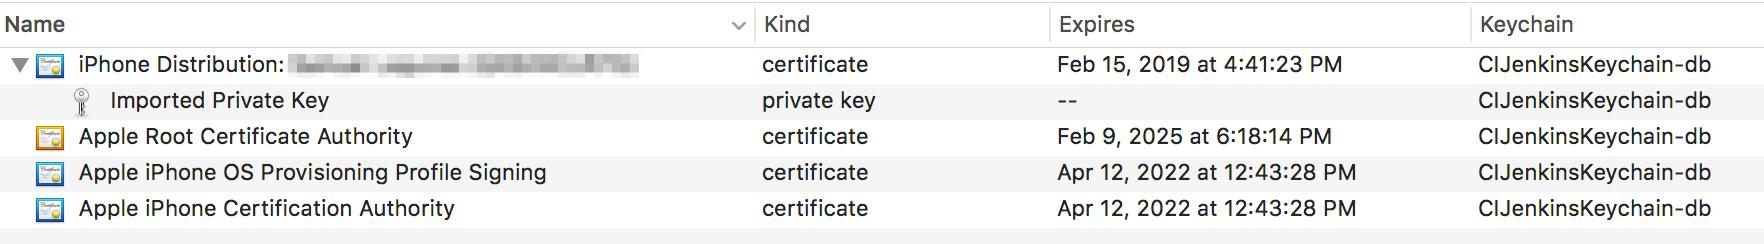 keychain_access